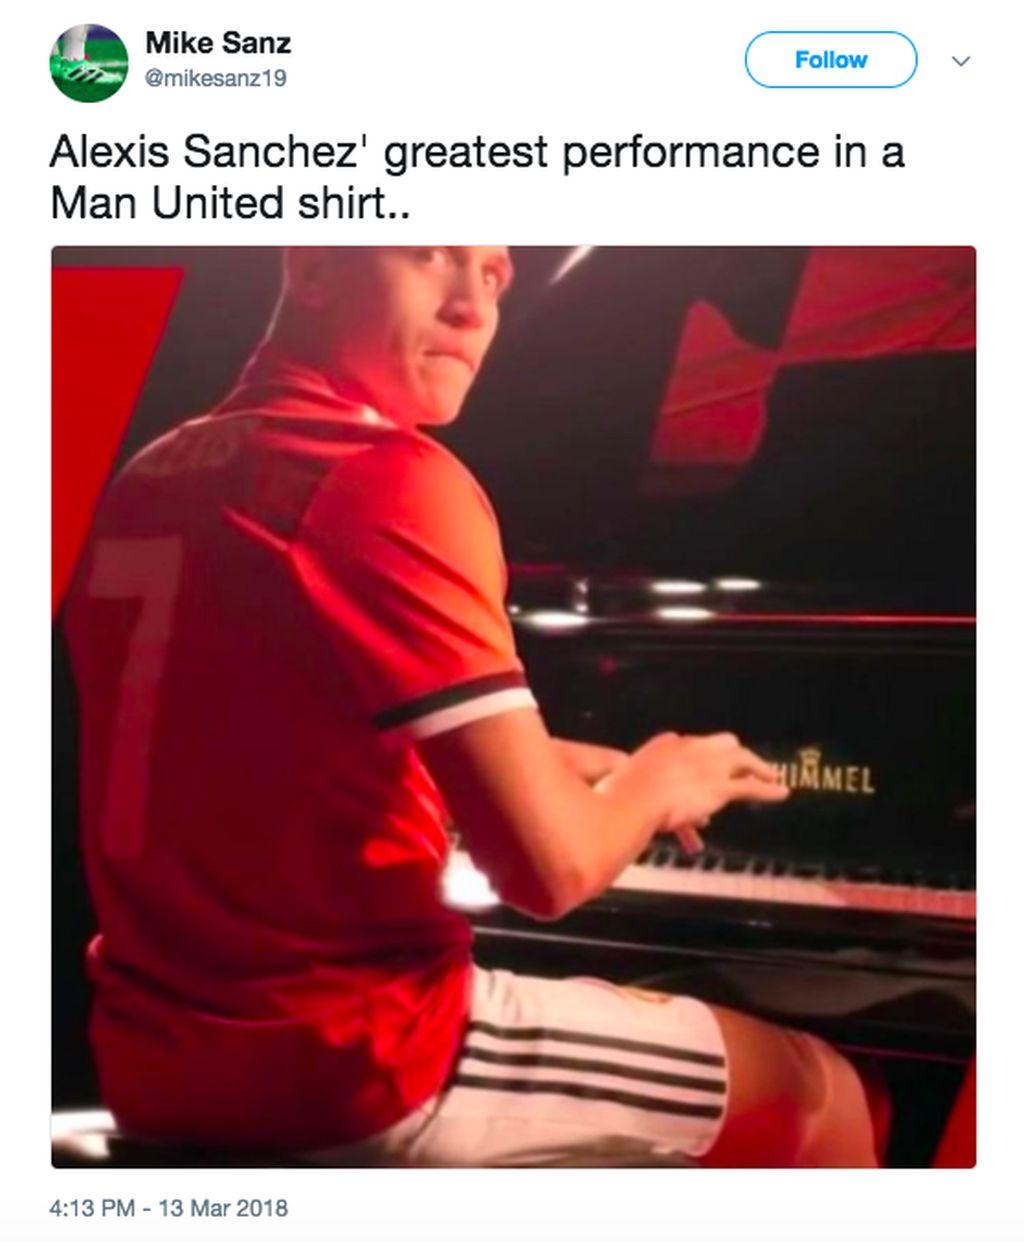 Manchester United semalam disingkirkan Sevilla di Liga Champion dan Alexis tampil payah. Di sini disinggung kalau performa terbaiknya adalah saat main piano dalam video perkenalannya sebagai pemain MU. Foto: istimewa